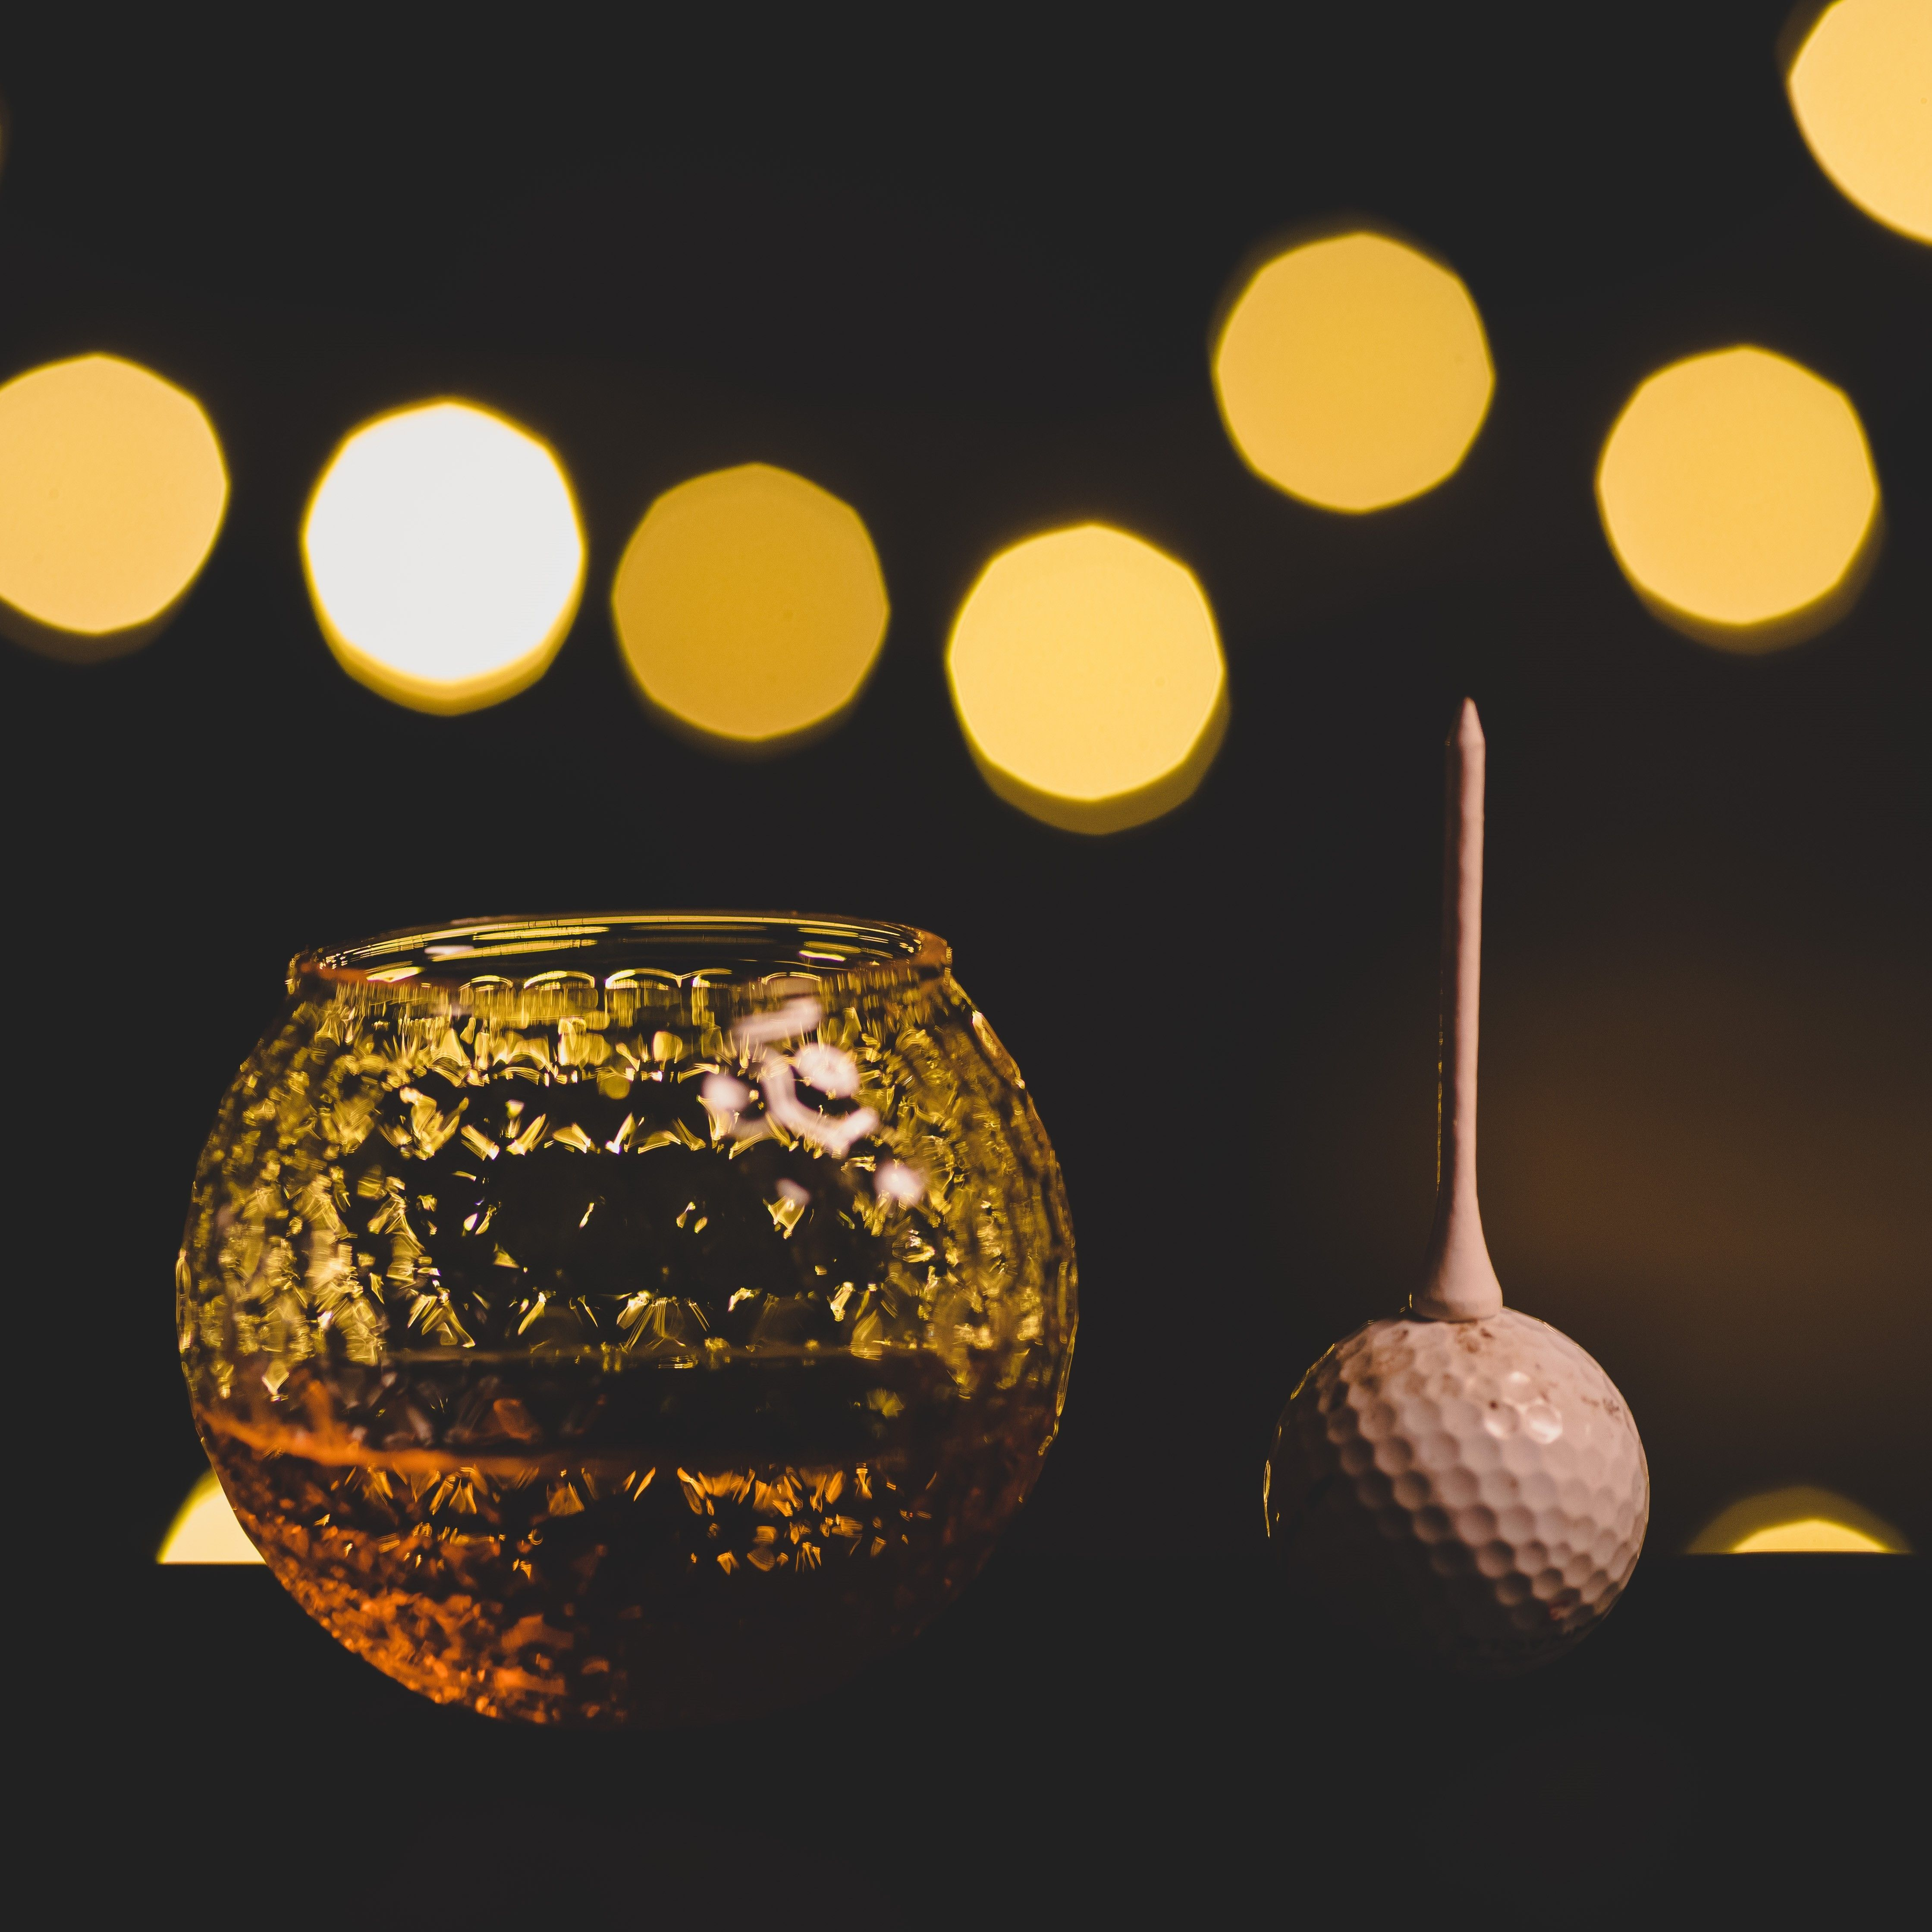 Golf Lovers Gift, Golf Shaped Whiskey Glasses